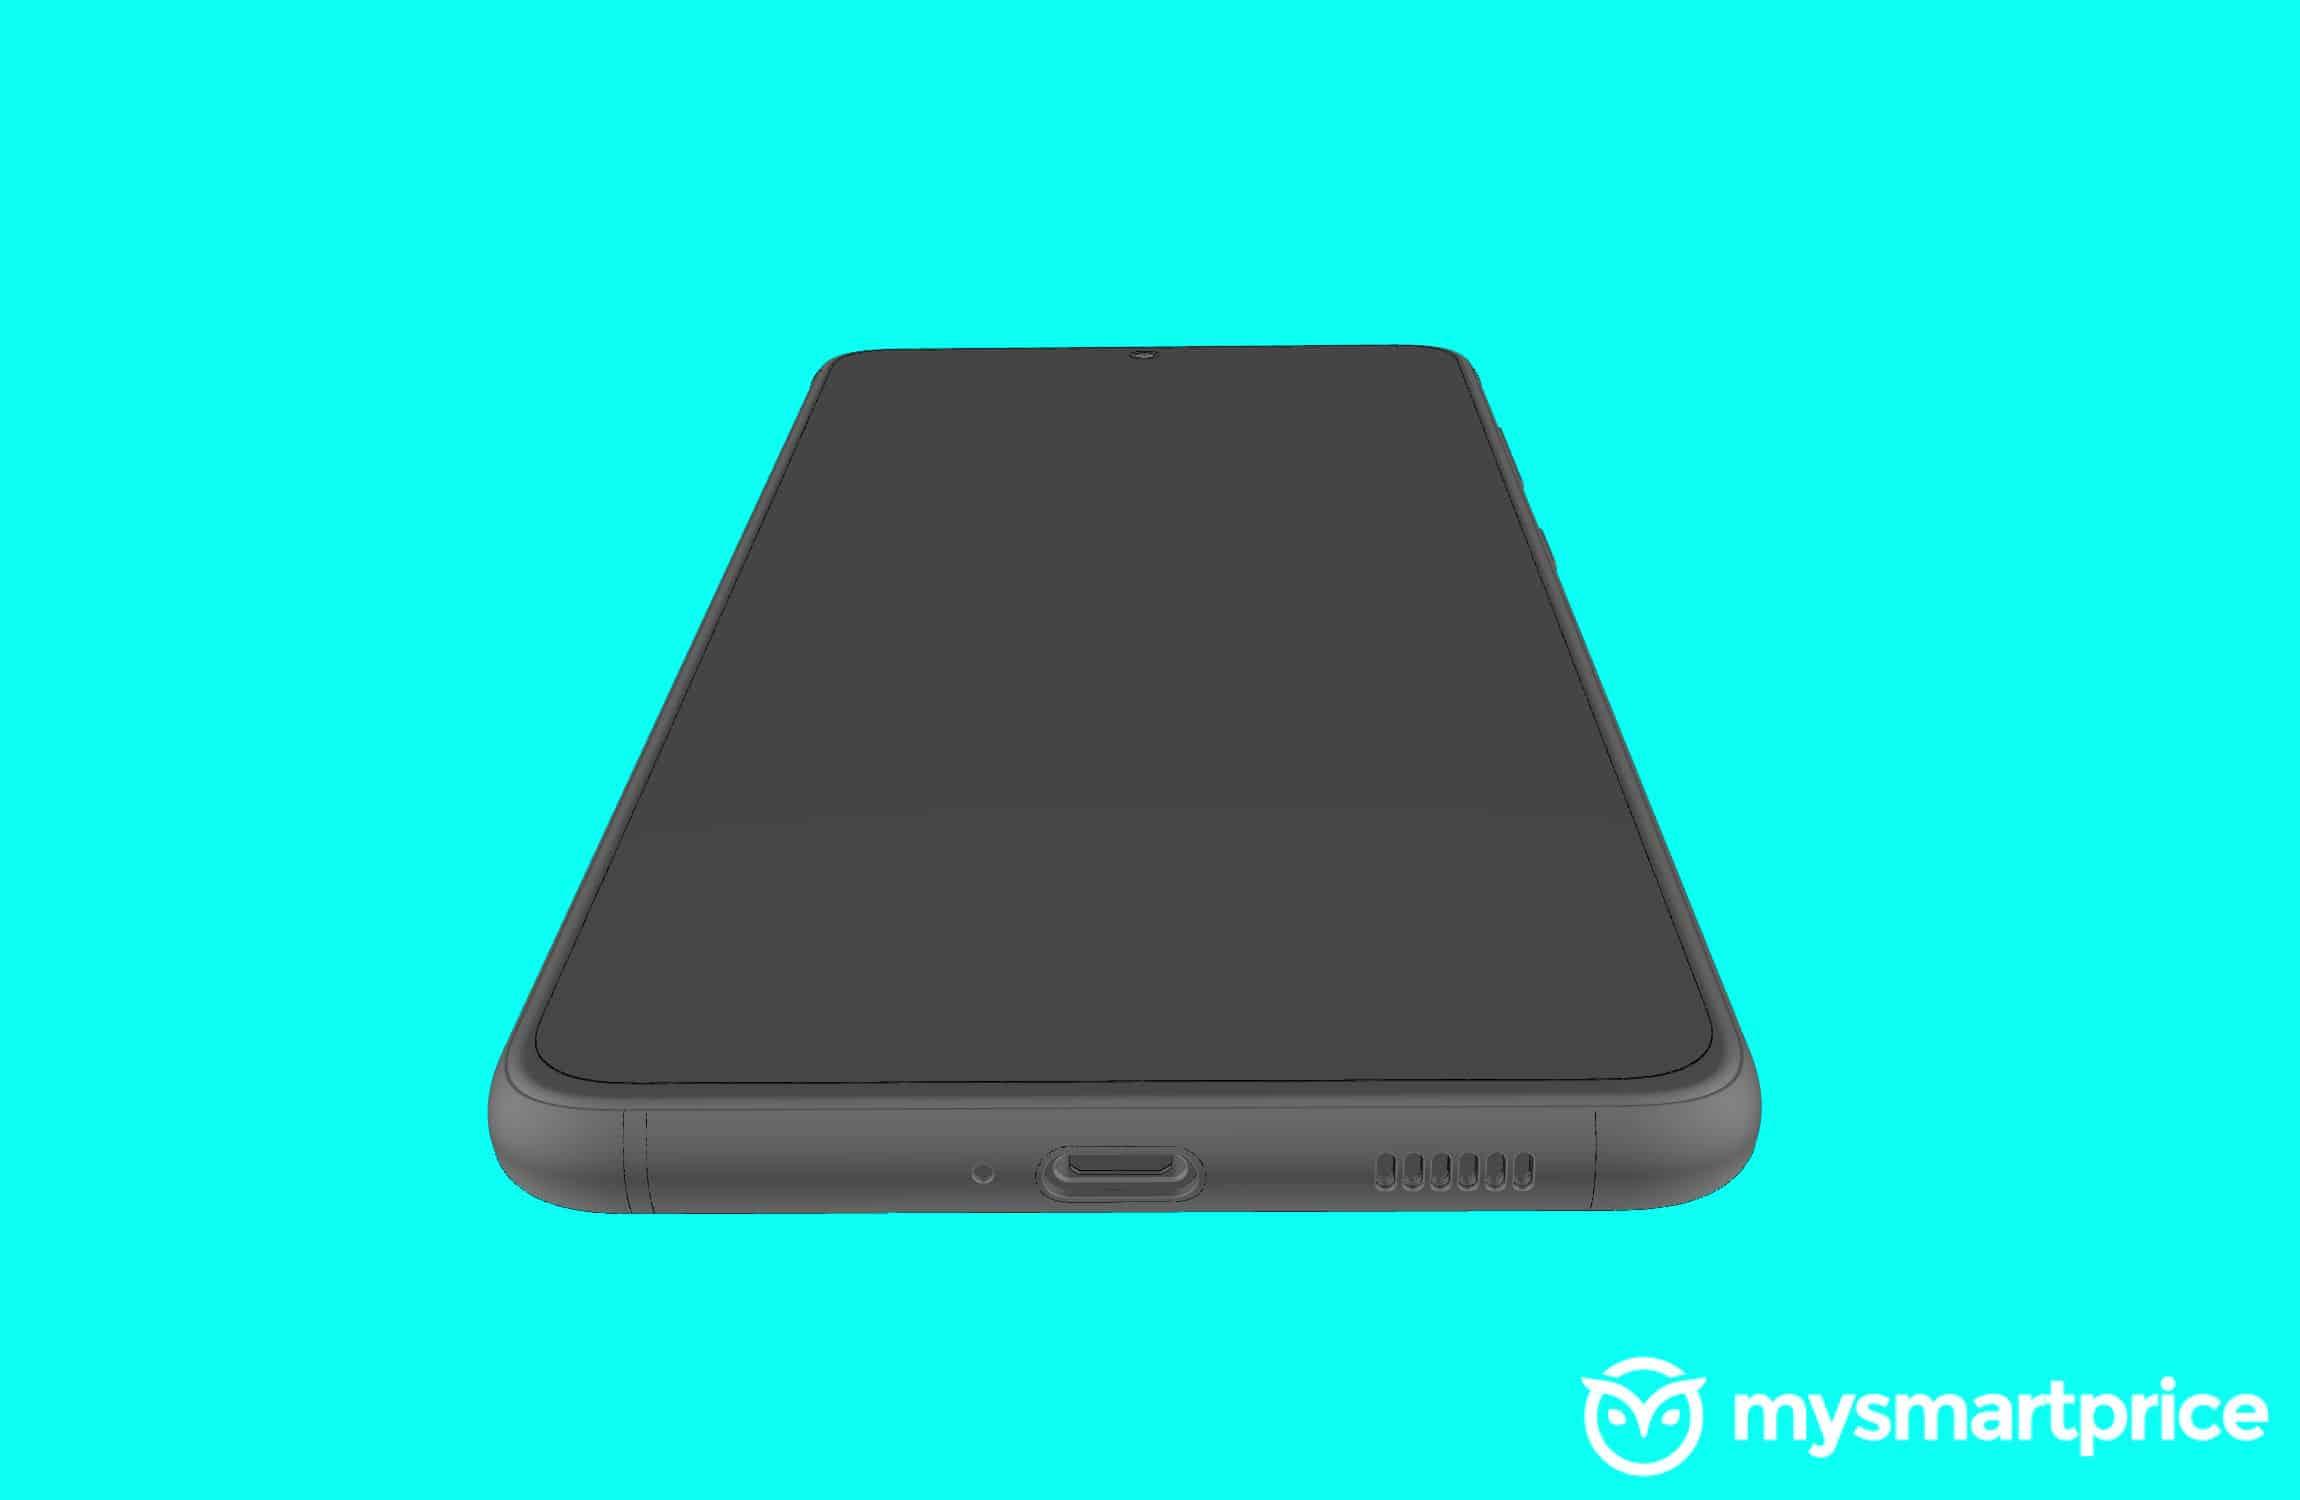 Samsung Galaxy 21 image render leak 4